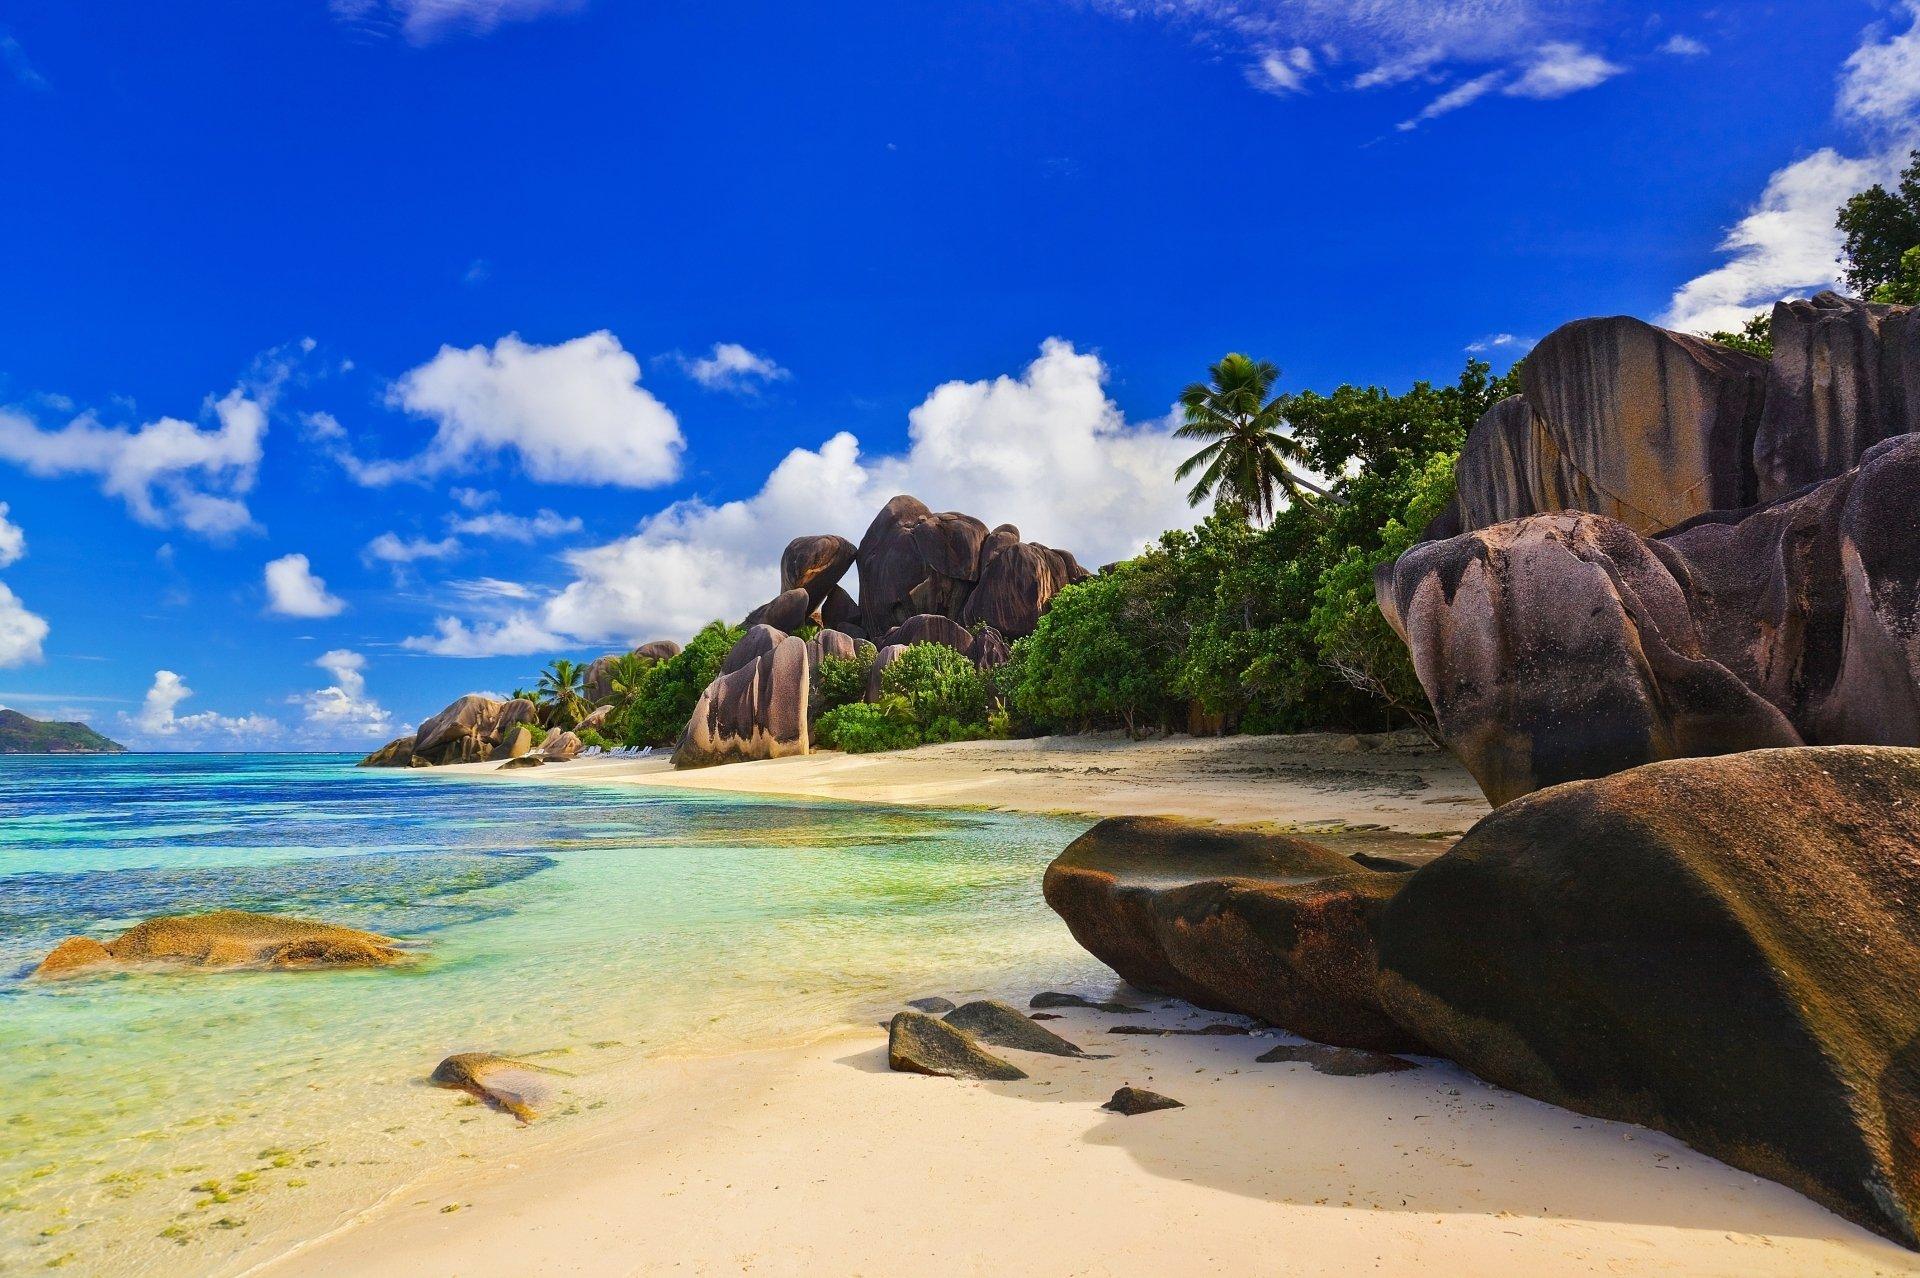 Bali Beach 4k Wallpapers Hd Download Free - Beach Desktop Background Hd , HD Wallpaper & Backgrounds